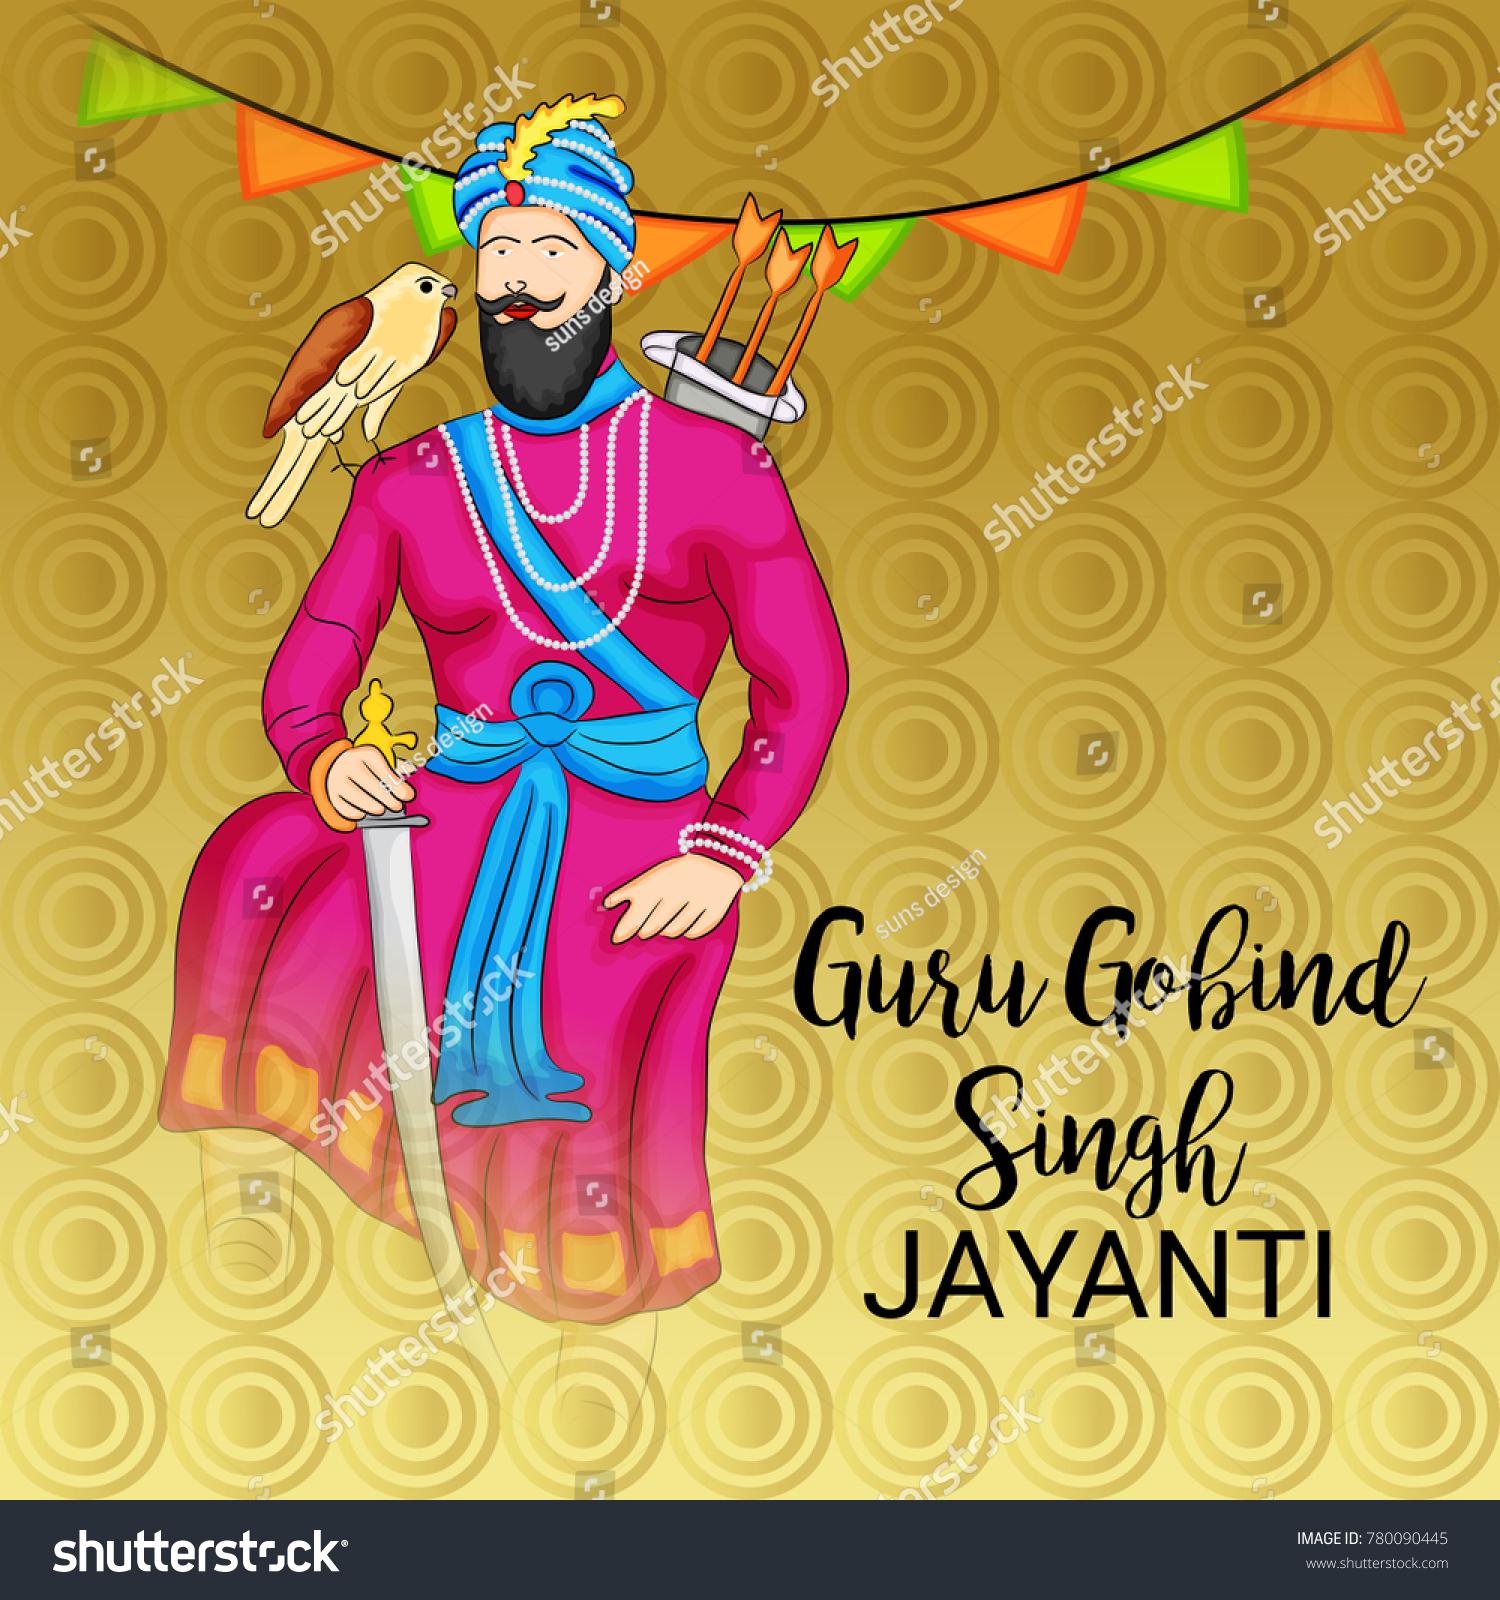 Vector Illustration Of A Banner For Happy Guru Gobind Singh Jayanti